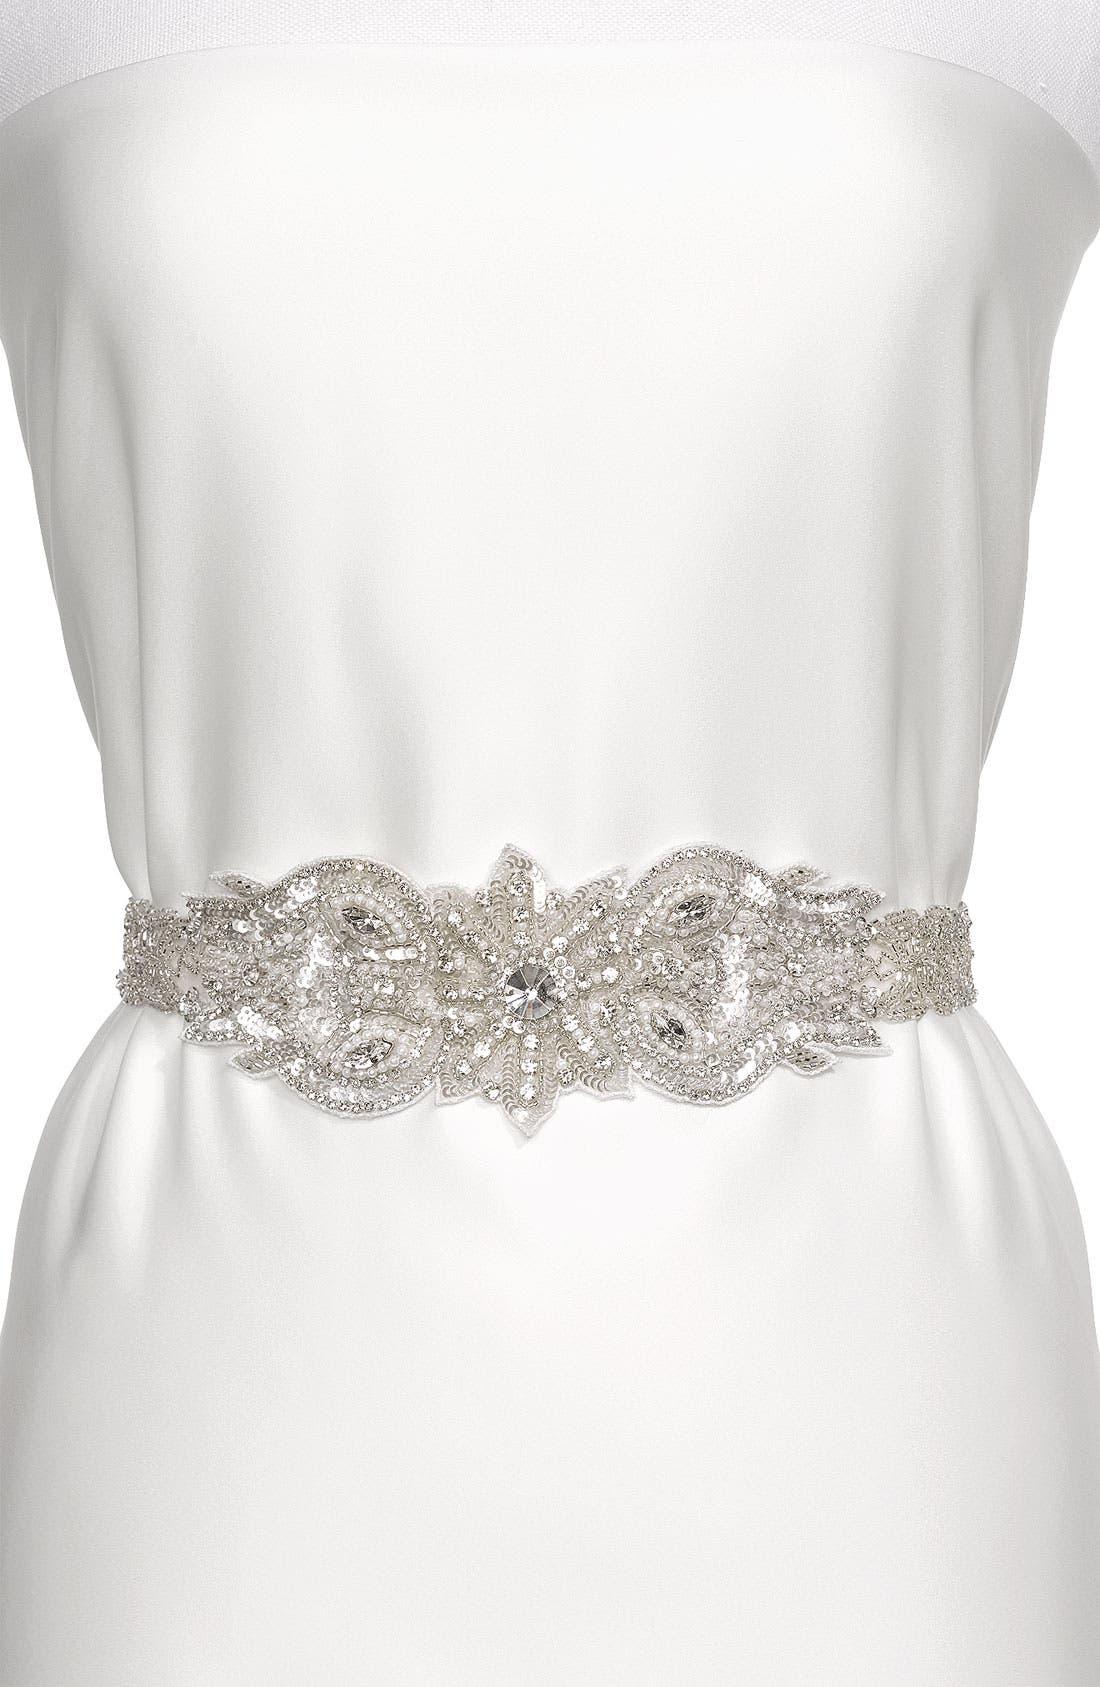 Main Image - Cara 'Vintage Crystal' Belt